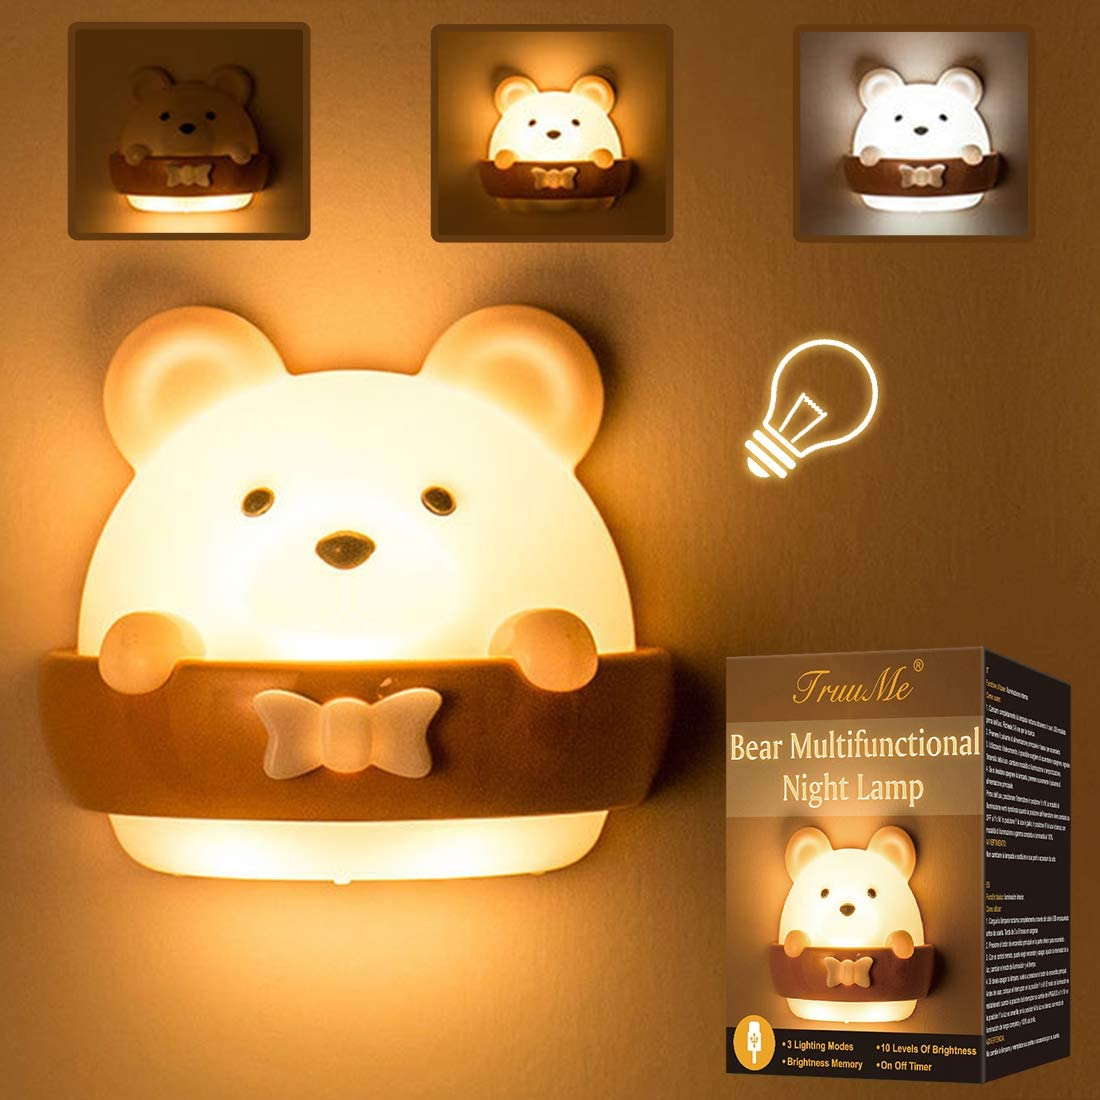 CIDBEST Best Baby Night Light